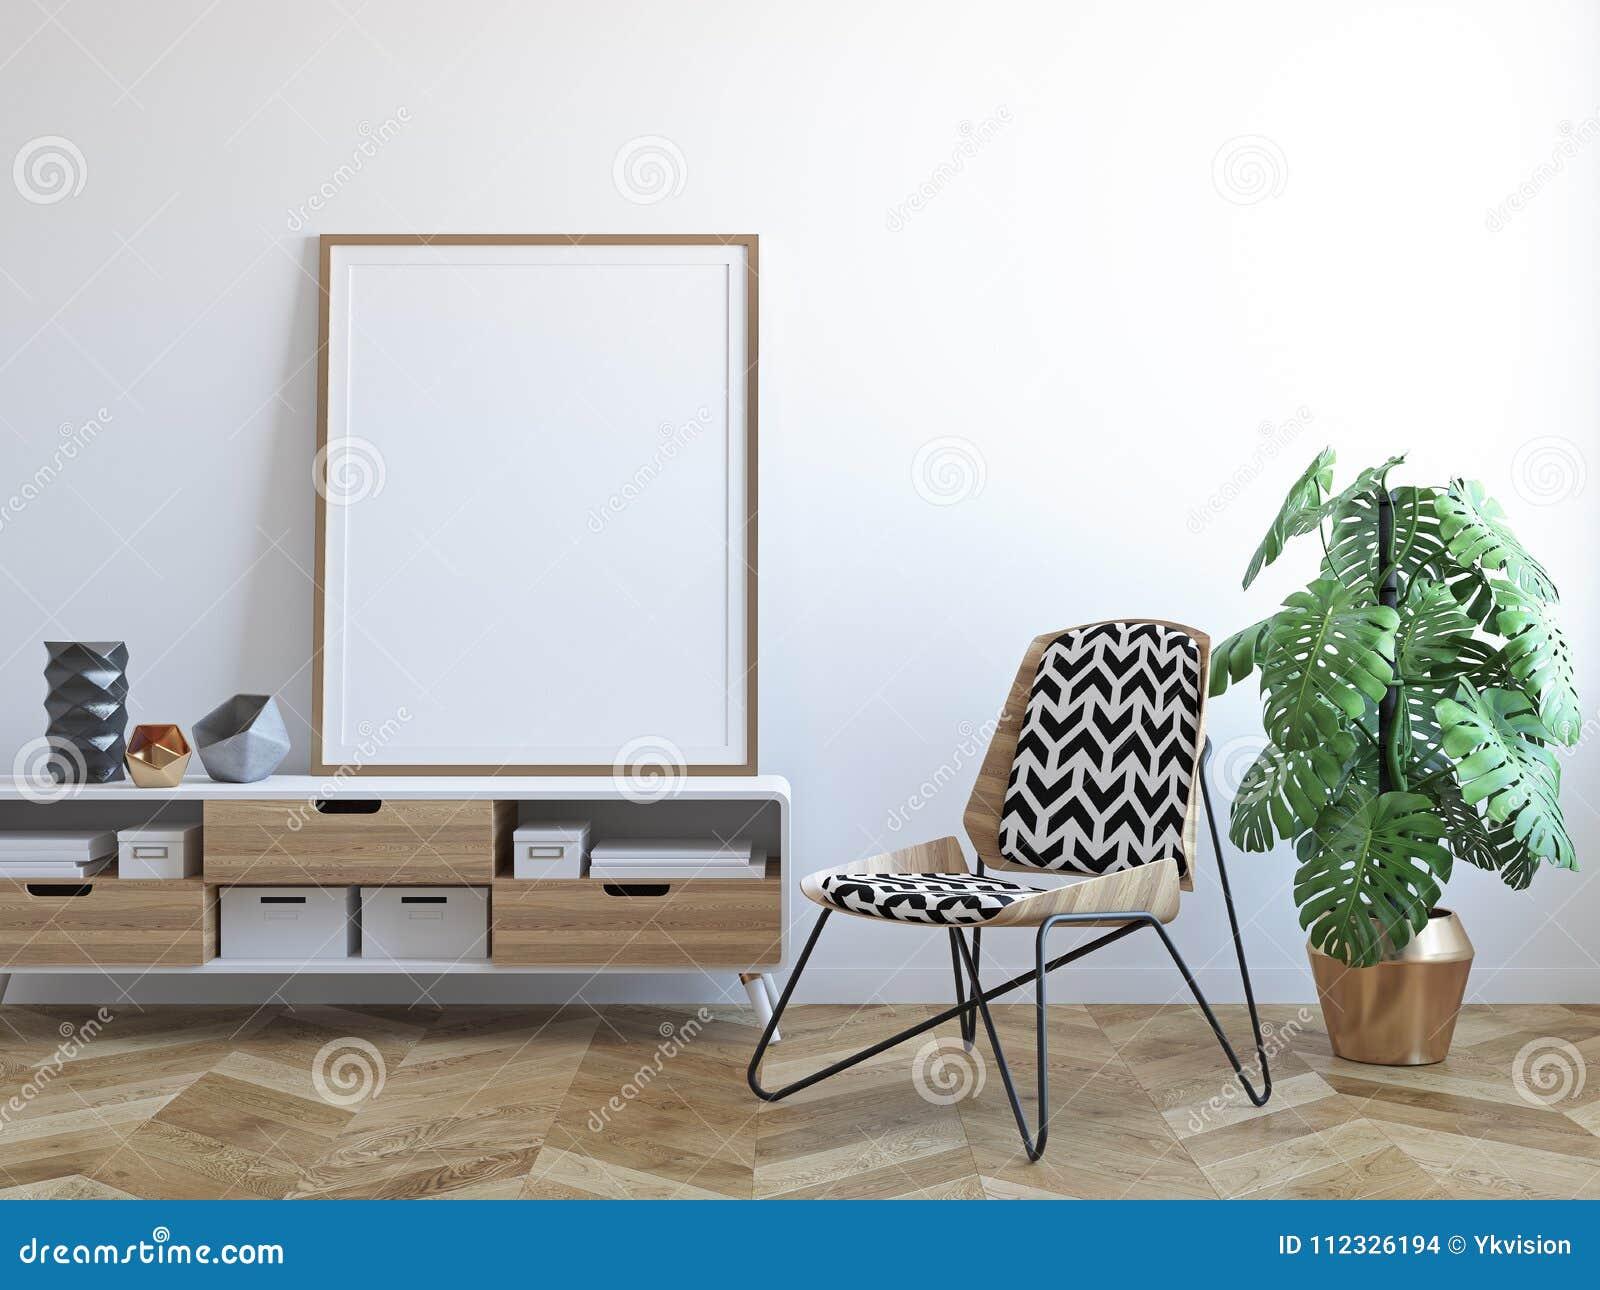 White Scandinavian Tropical Interior With Chair, Dresser, Plant, Frame. 3d  Render Illustration Mock Up.